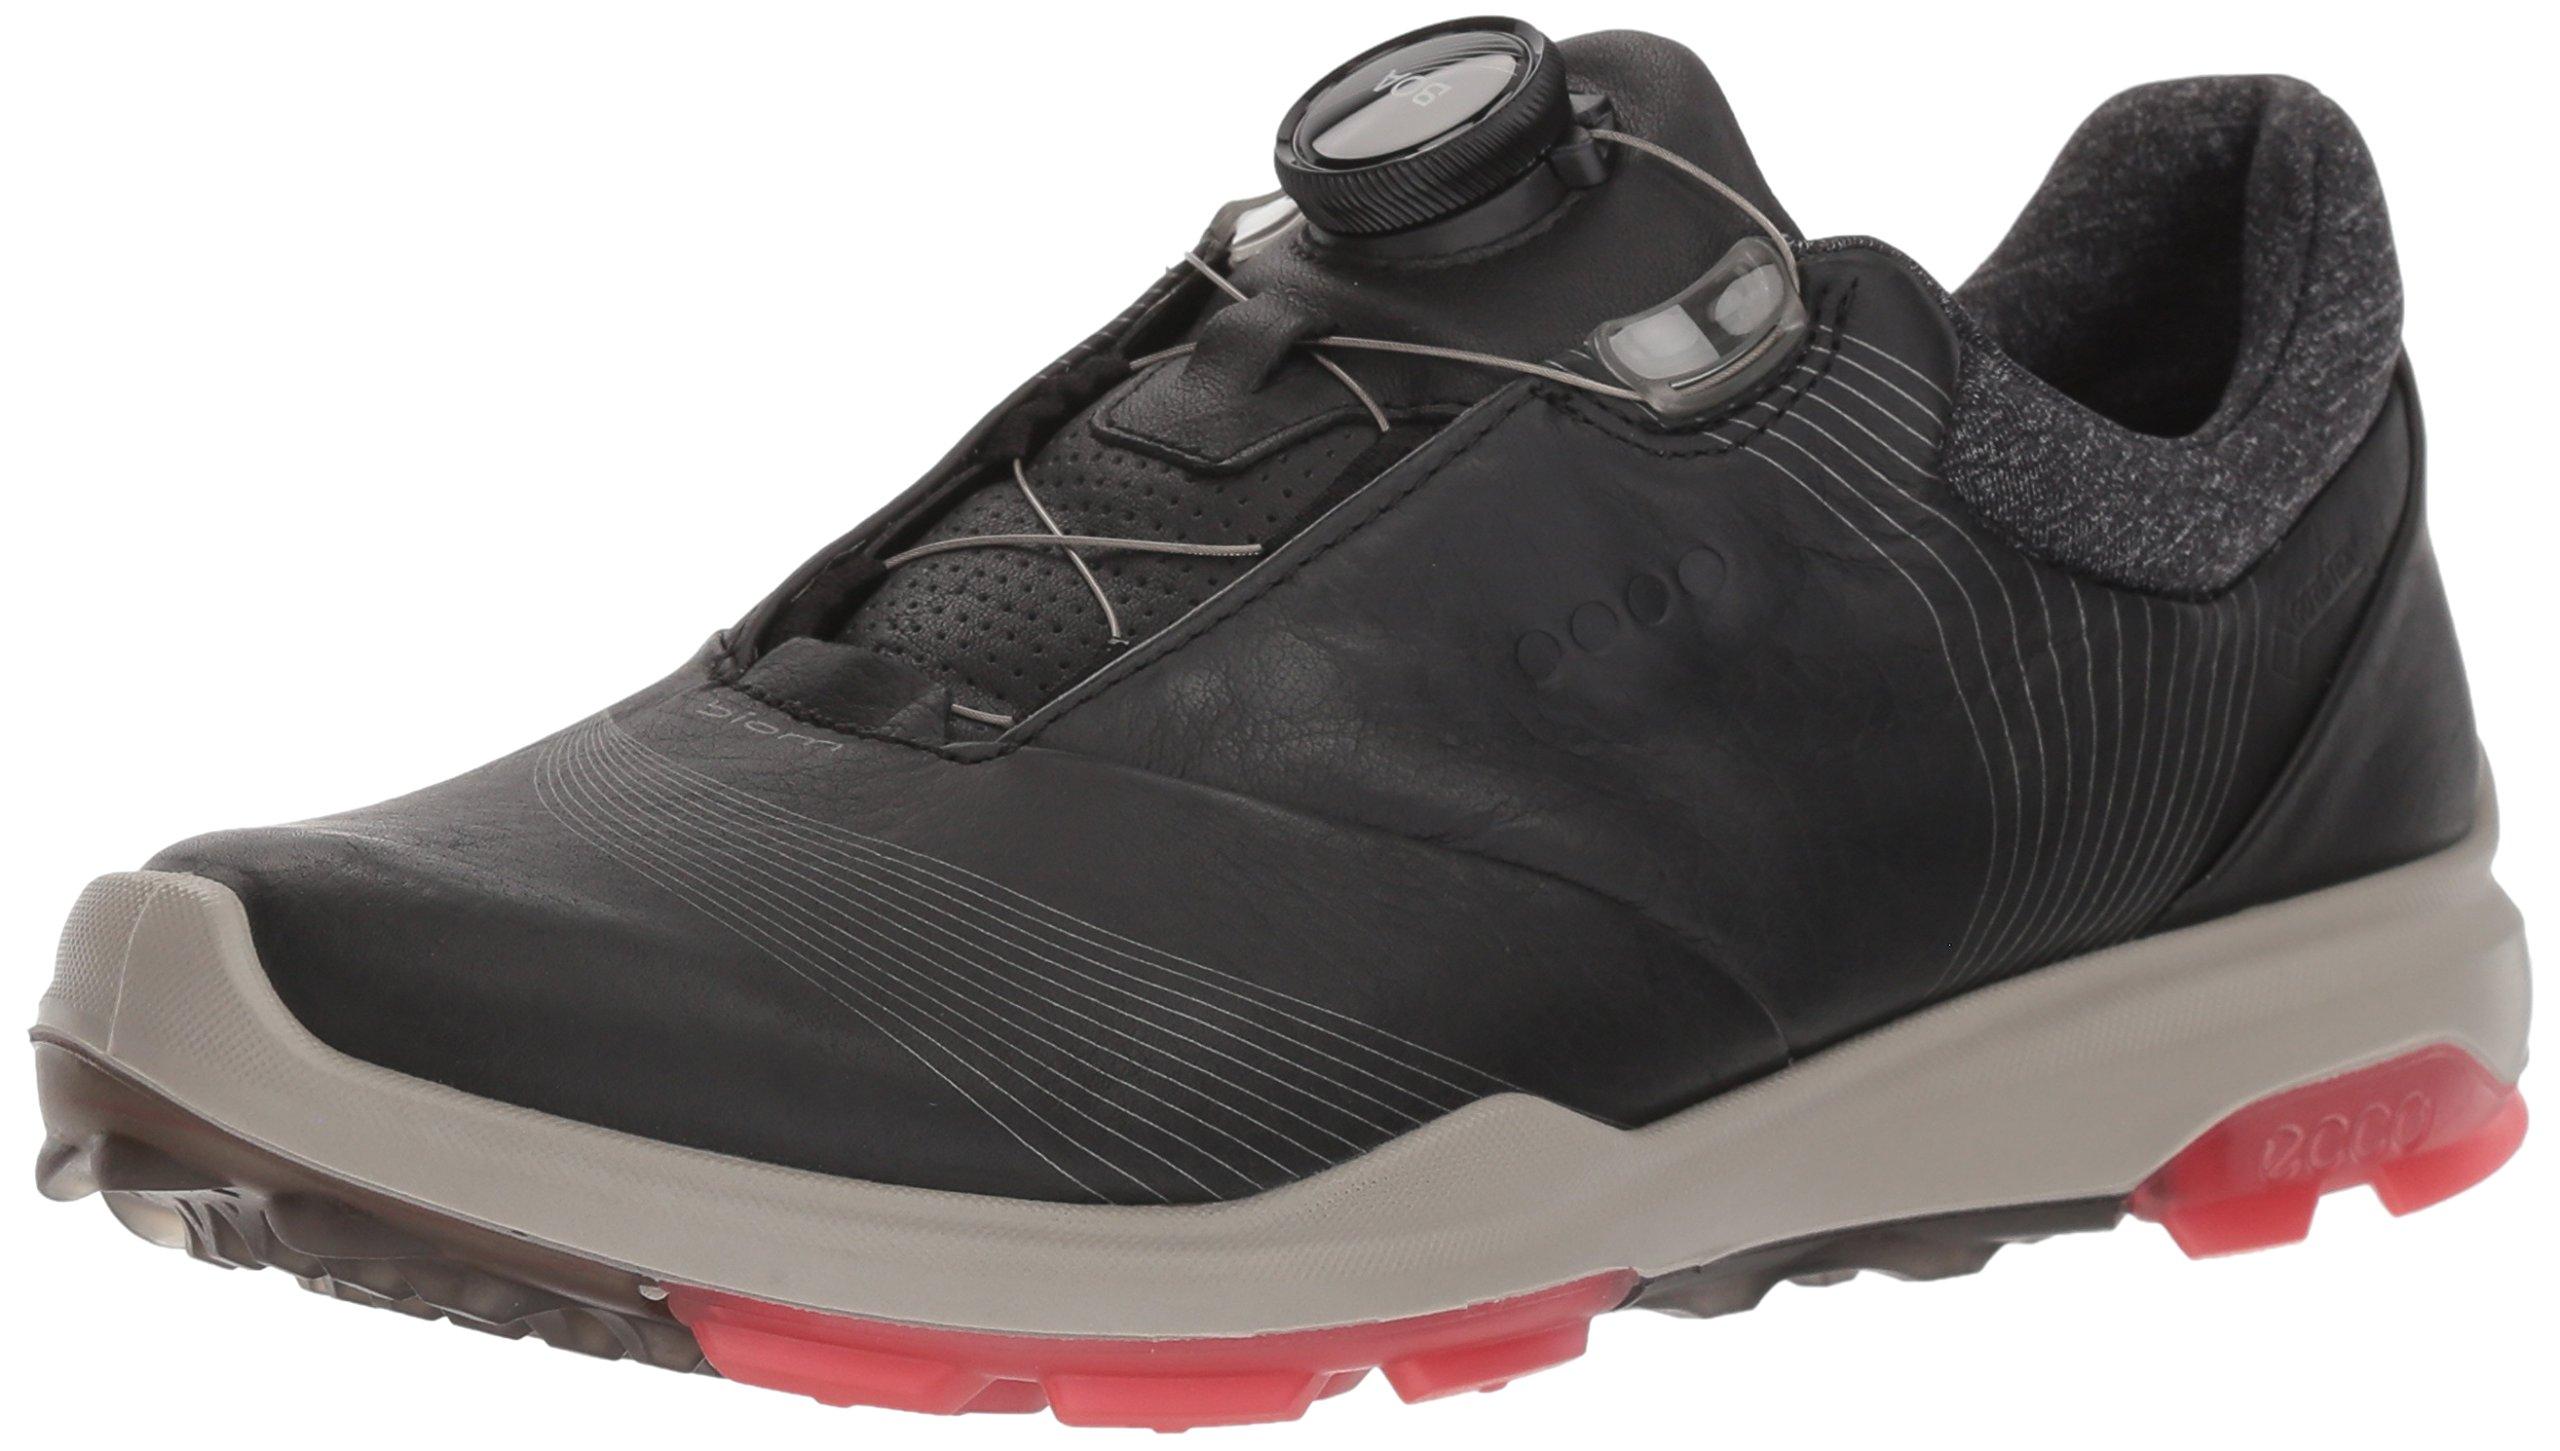 ECCO Women's Biom Hybrid 3 BOA Gore-Tex Golf Shoe, Black/Teaberry Yak Leather, 11 M US by ECCO